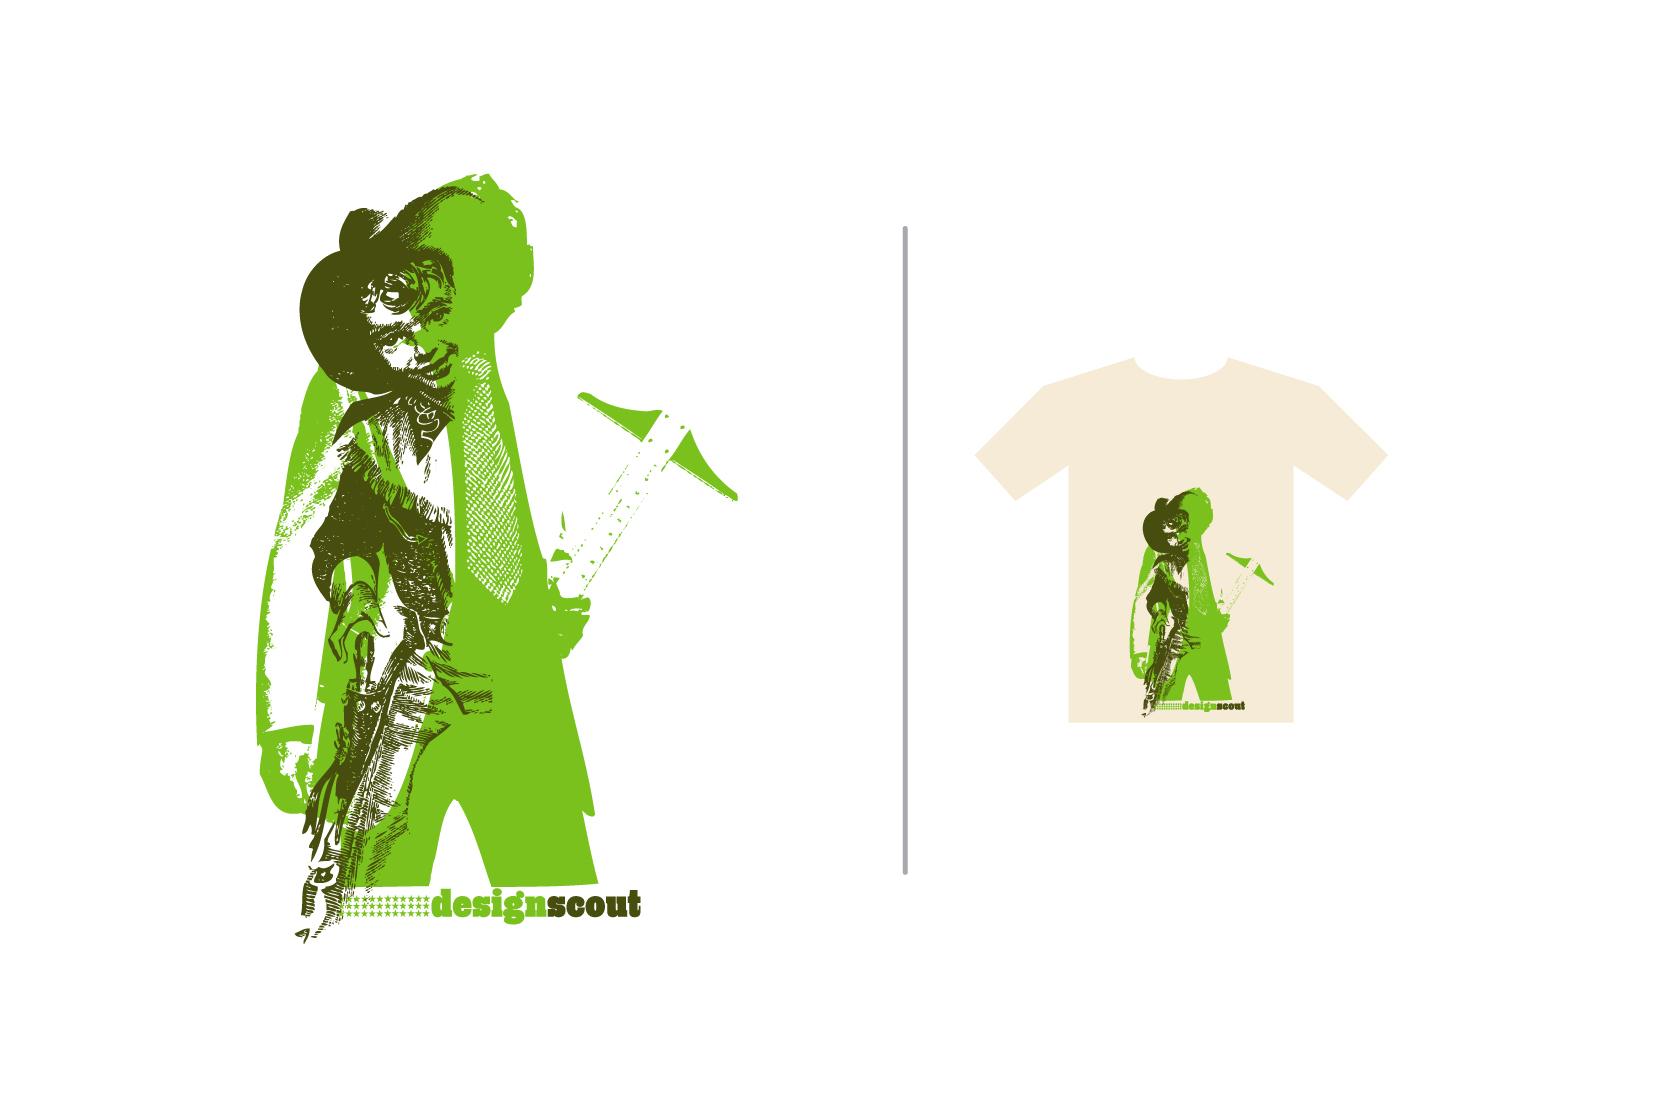 designscout.jpg